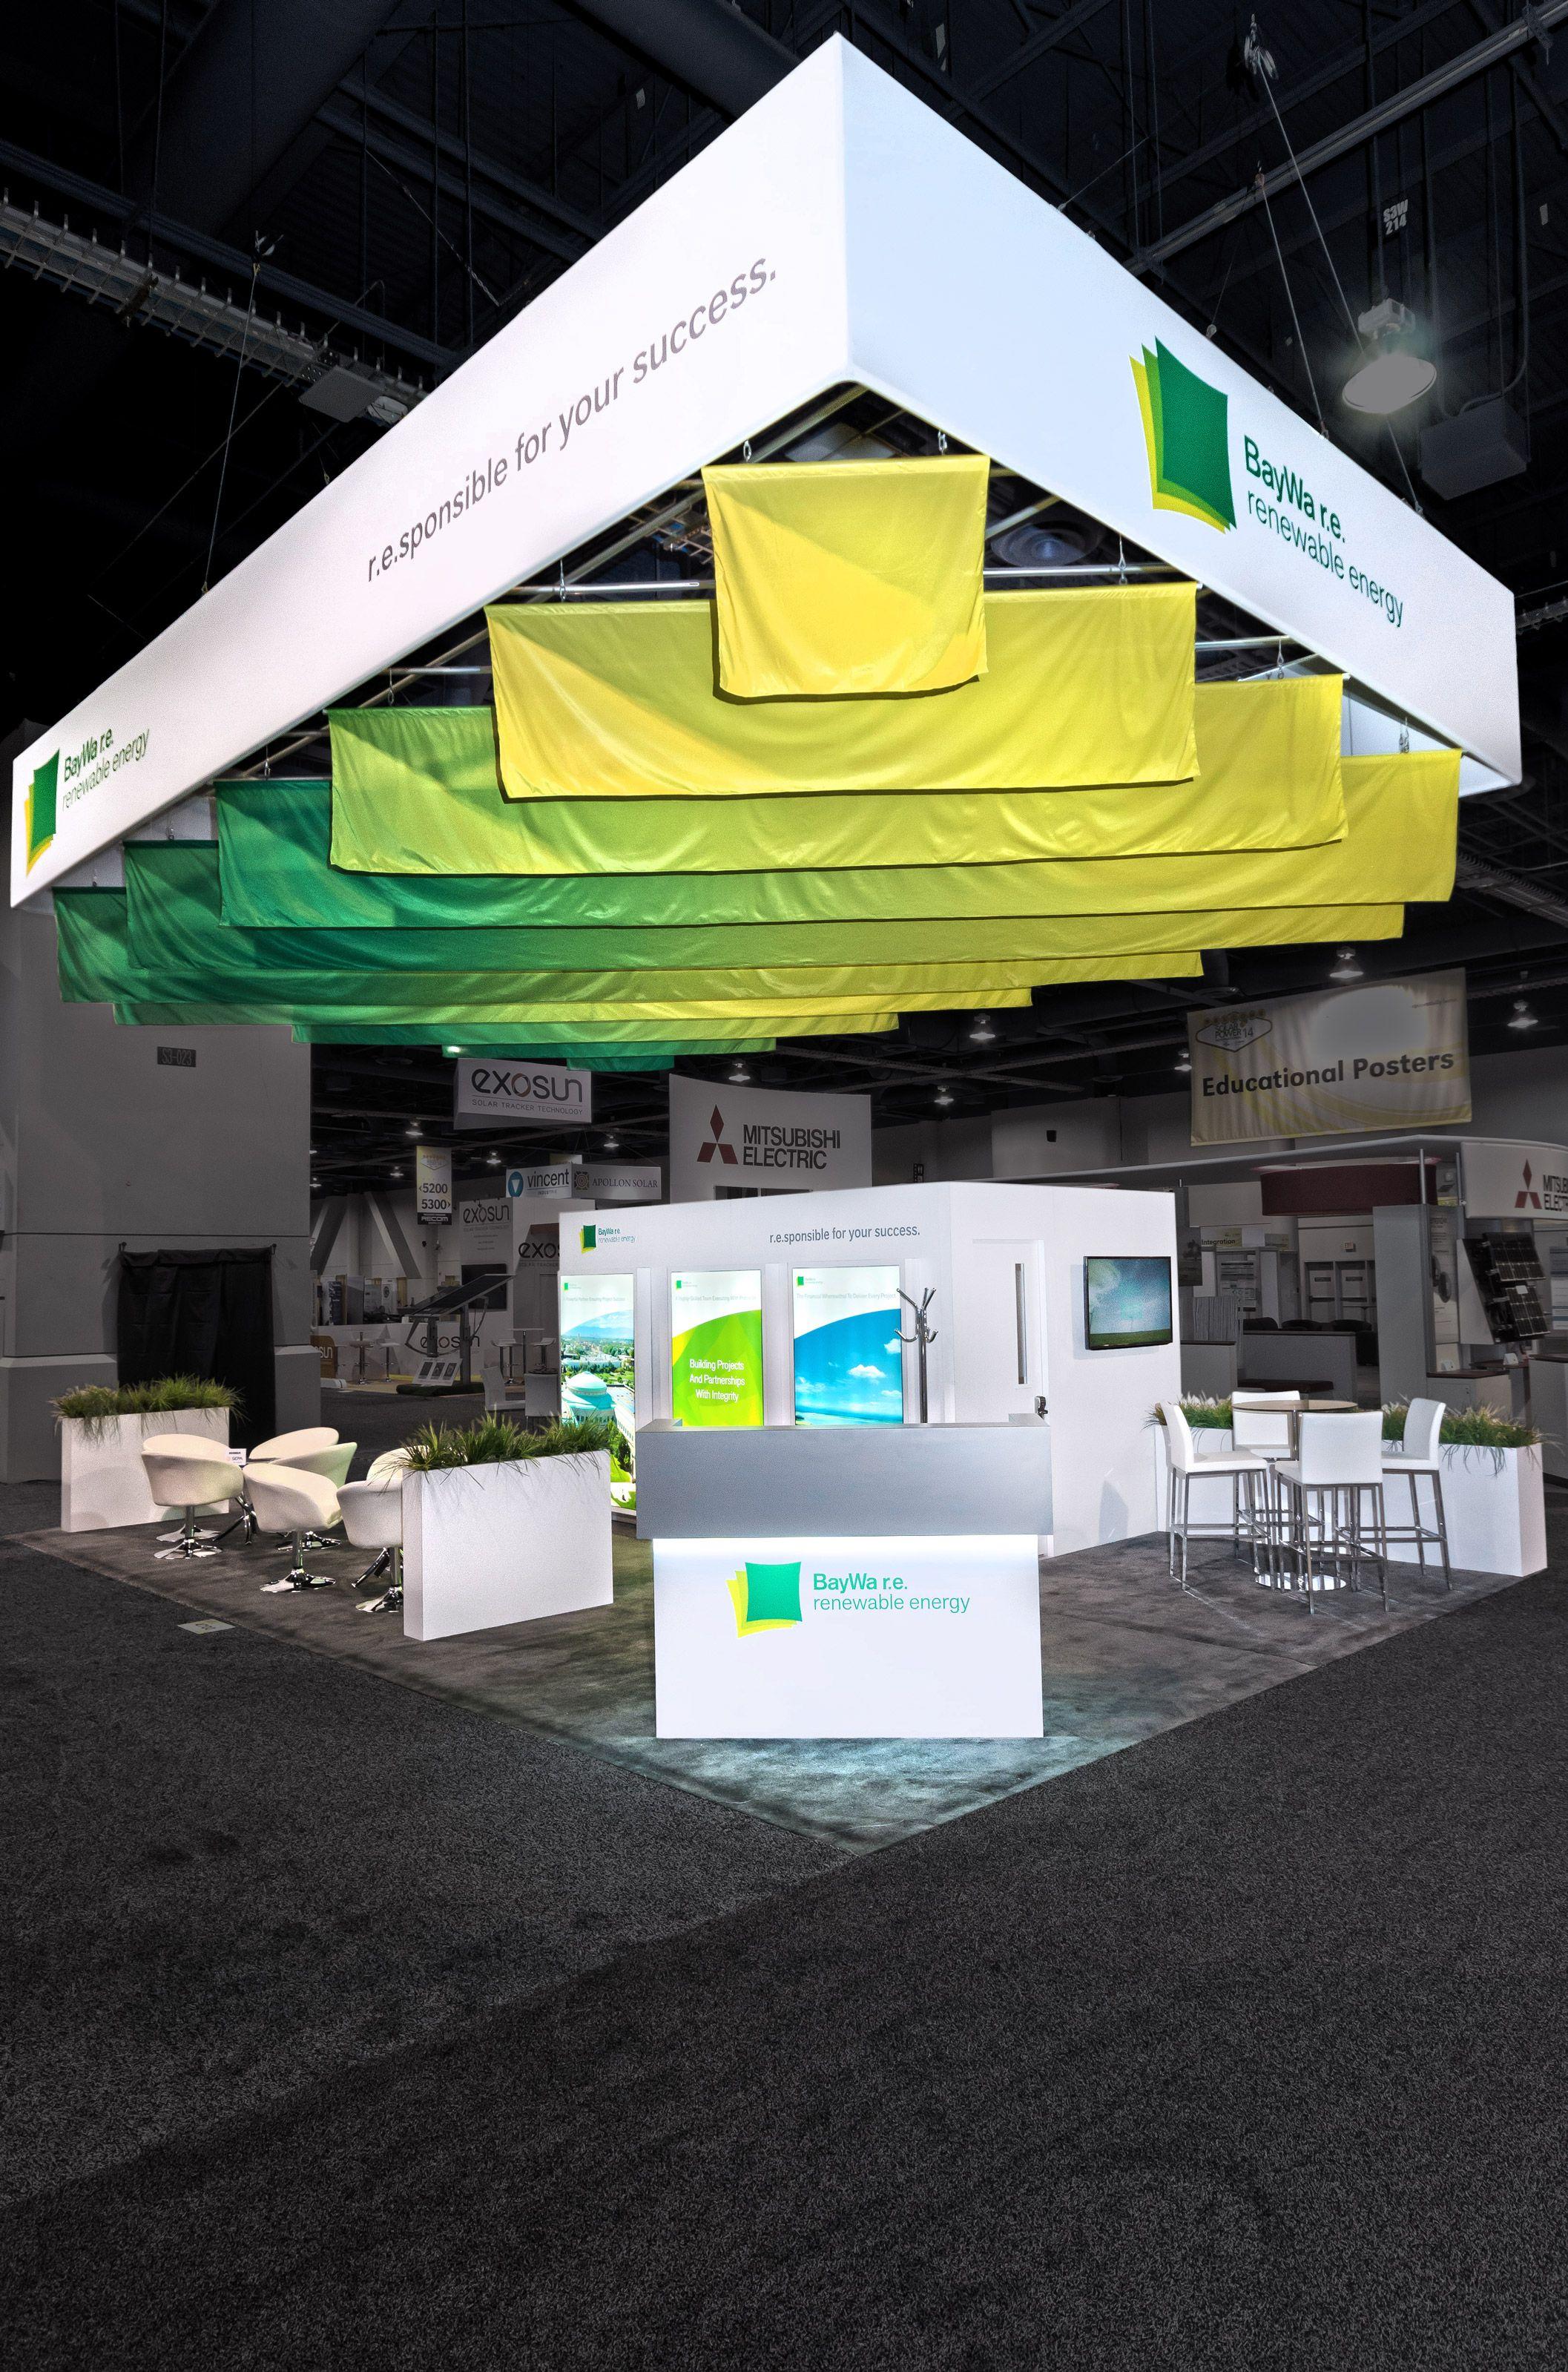 Design Exhibitions 2014 baywa.r.e. #booth design @ spi show 2014. #design & #fabrication